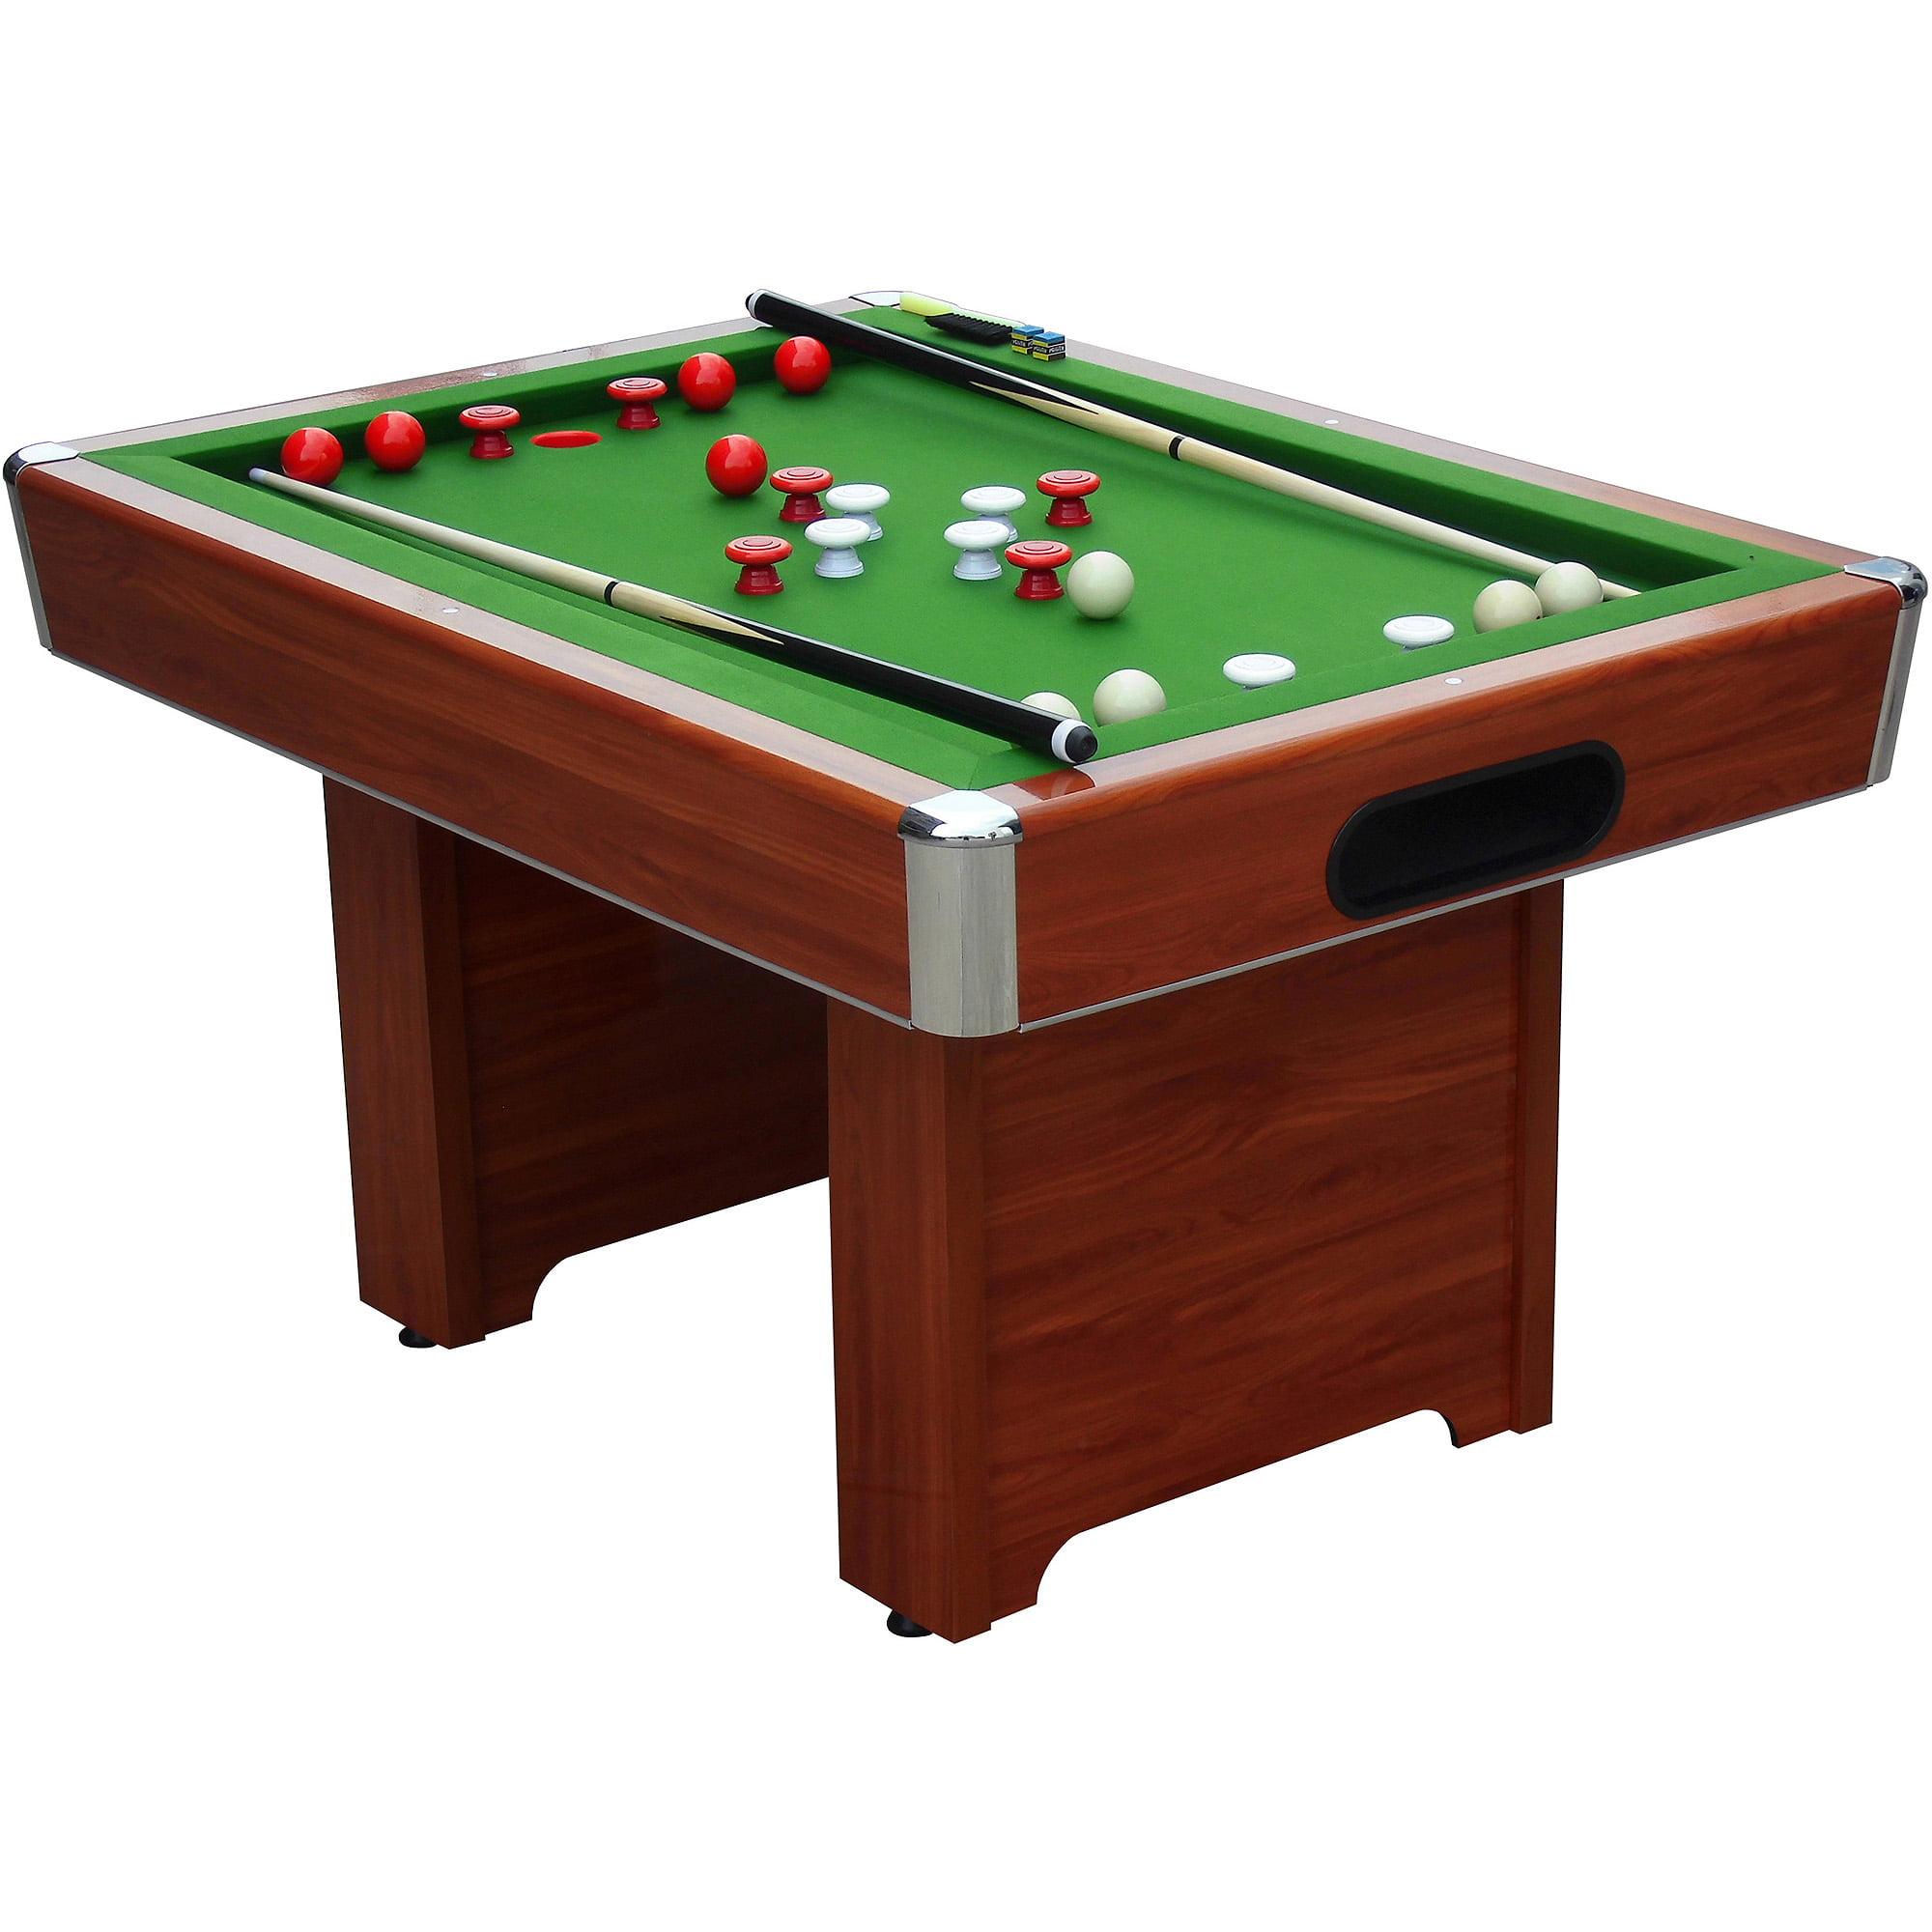 Playcraft Hartford Slate Chery Bumper 4.5' Pool Table